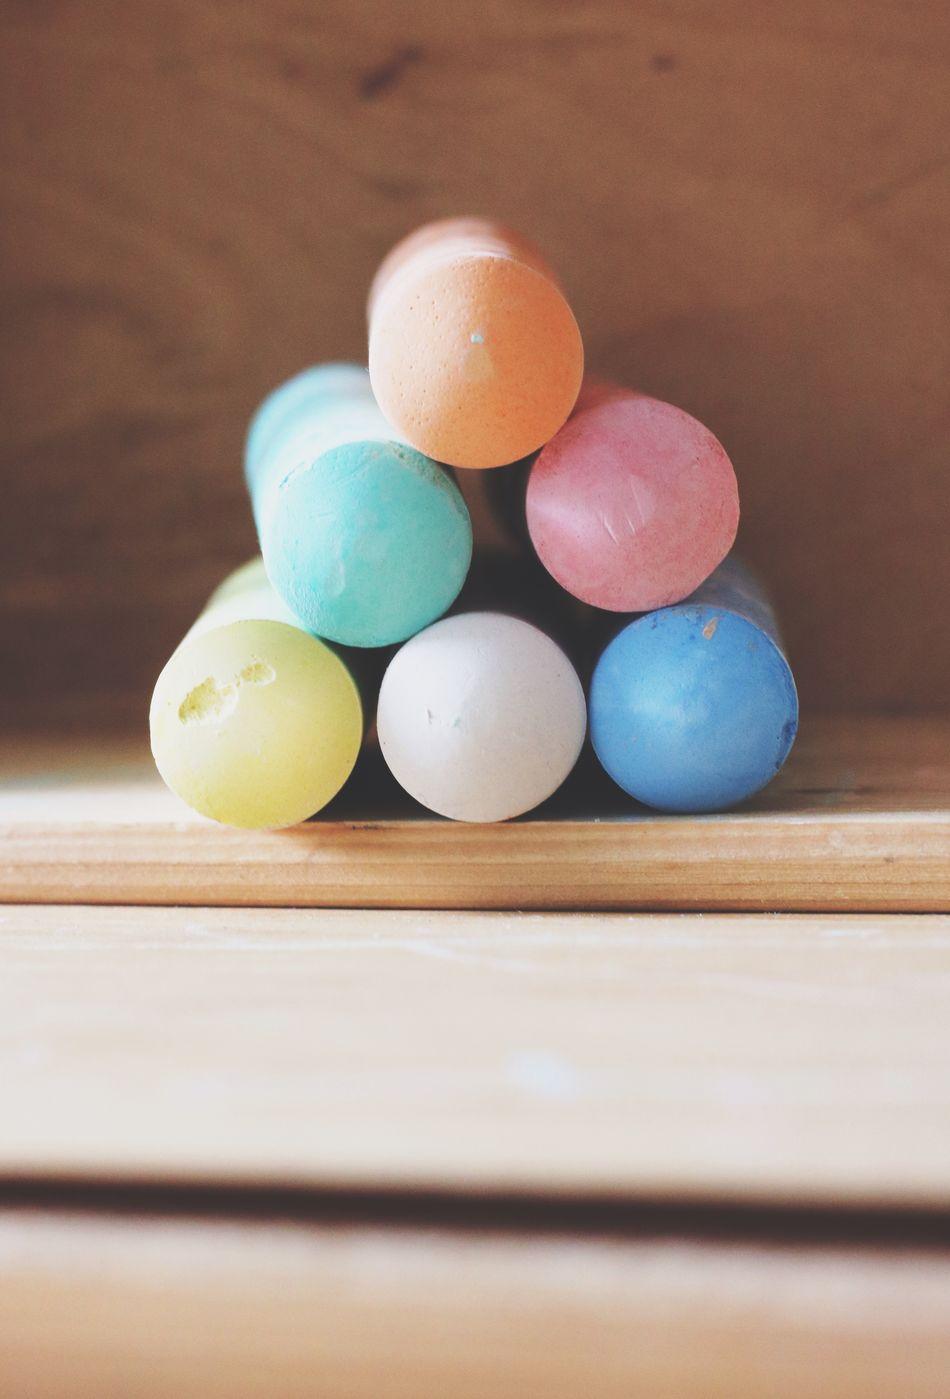 Wood - Material Multi Colored Chalk Tool Tools School